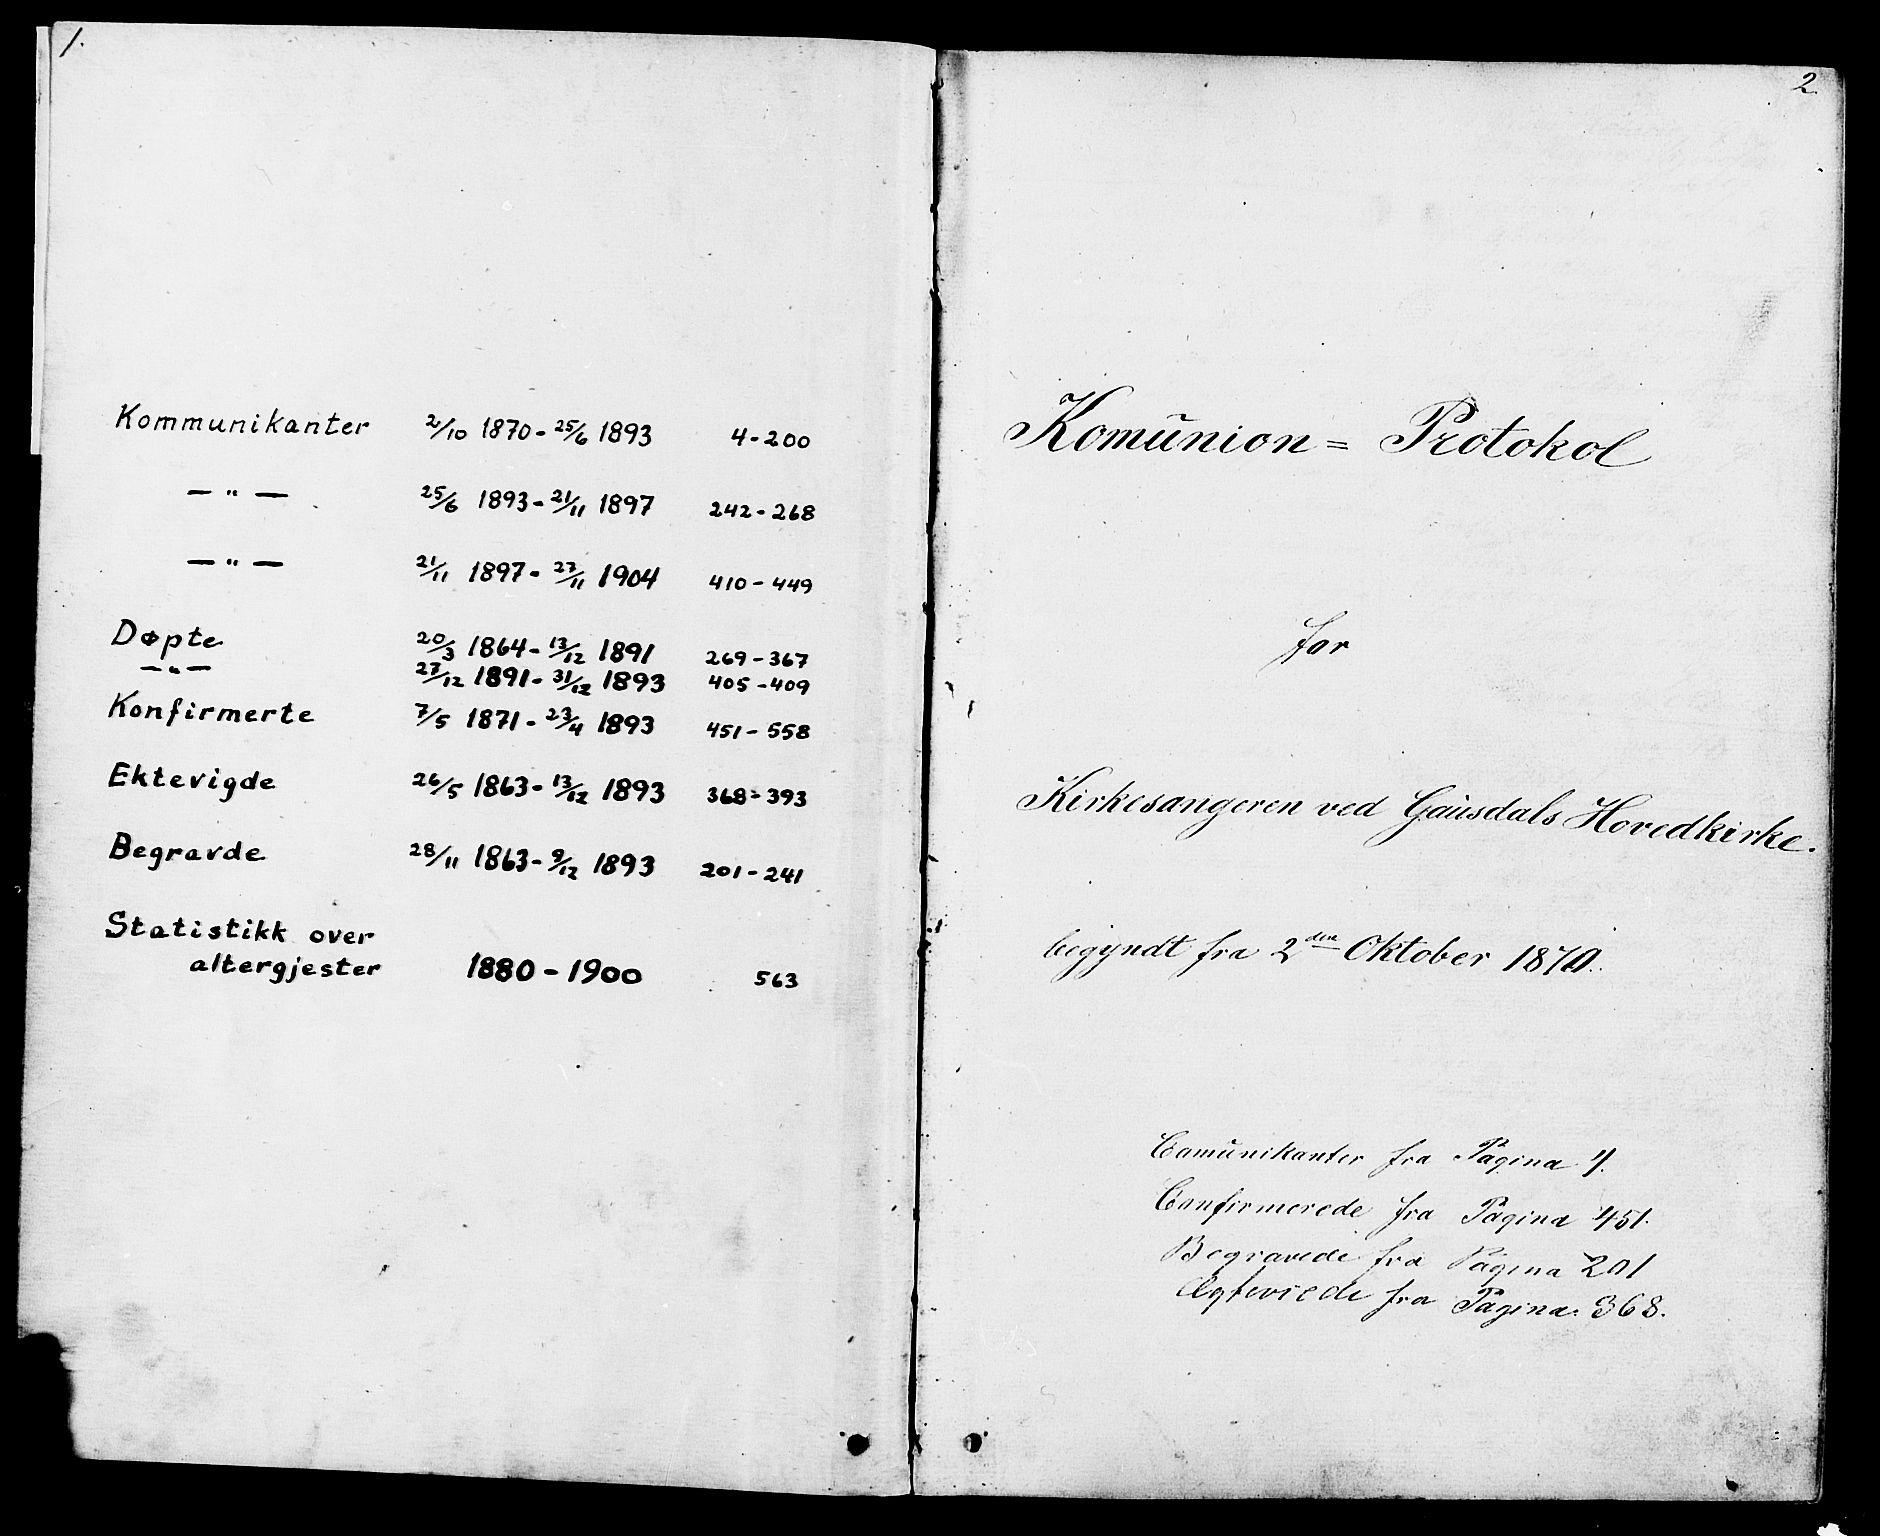 SAH, Østre Gausdal prestekontor, Klokkerbok nr. 1, 1863-1893, s. 1-2